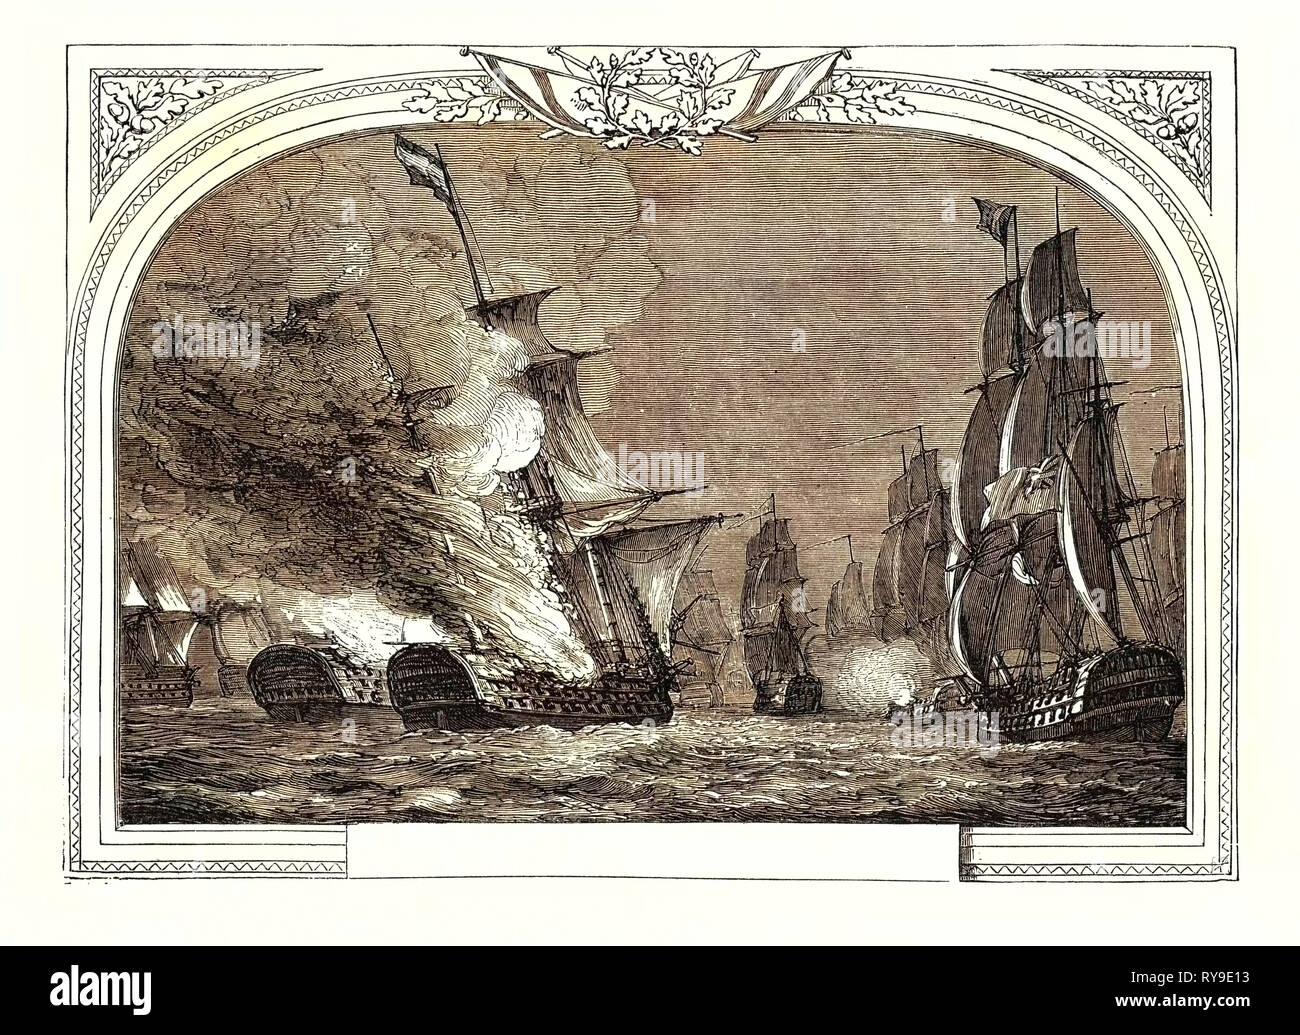 Battle Off Cabarela Point, (Admiral Sir J. Saumarez), July 12th, 1801. Destruction of the Rea Carlos and San Hermenegildo. James Saumarez, 1st Baron De Saumarez (1757  1836), Admiral of the Royal Navy - Stock Image